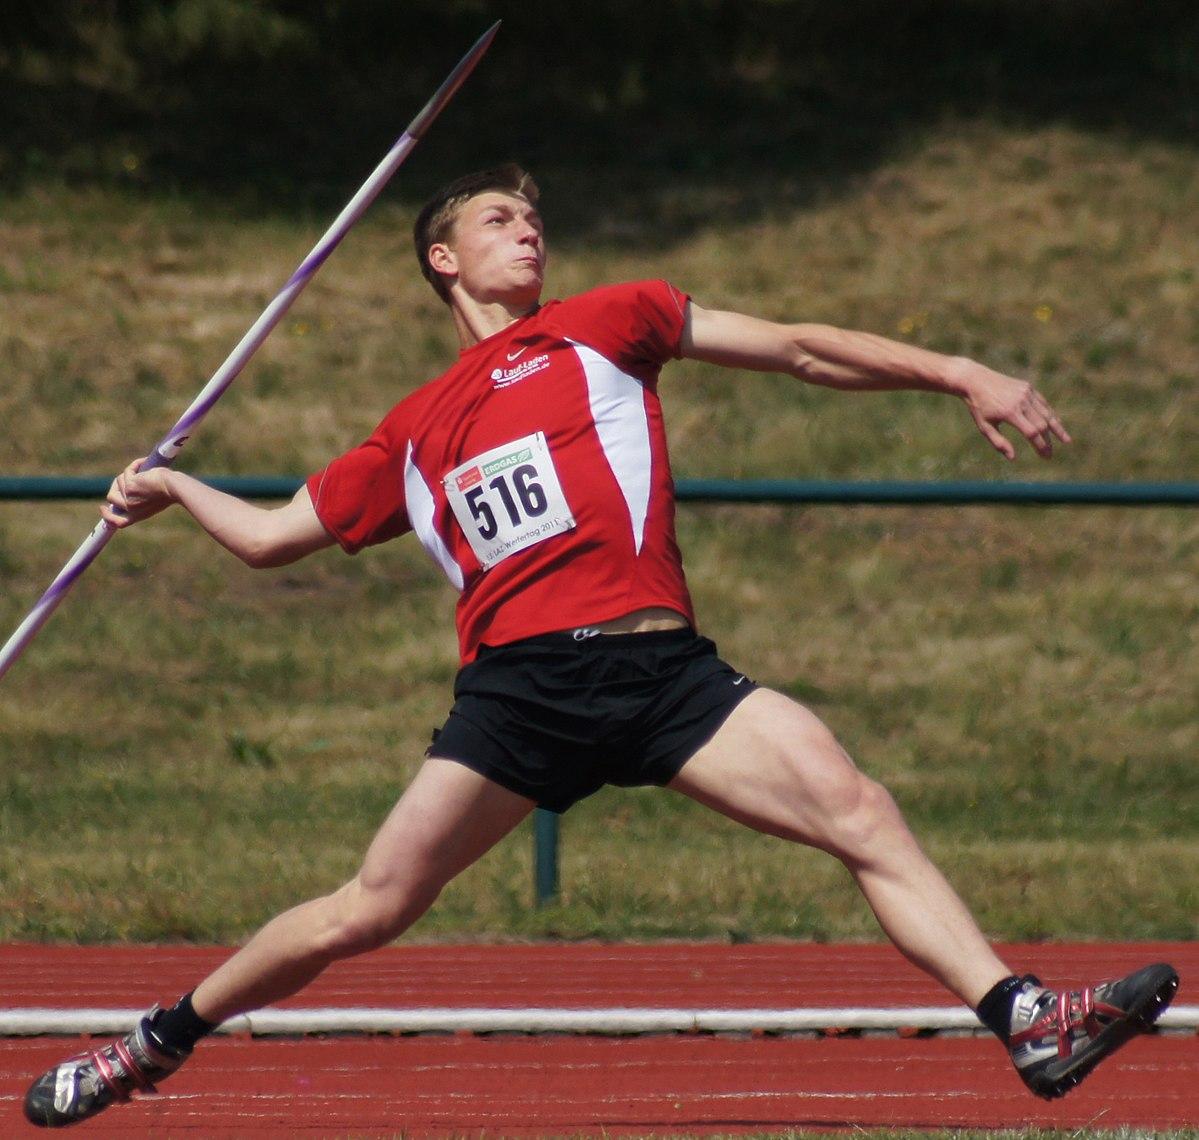 Javelin throw Wikipedia